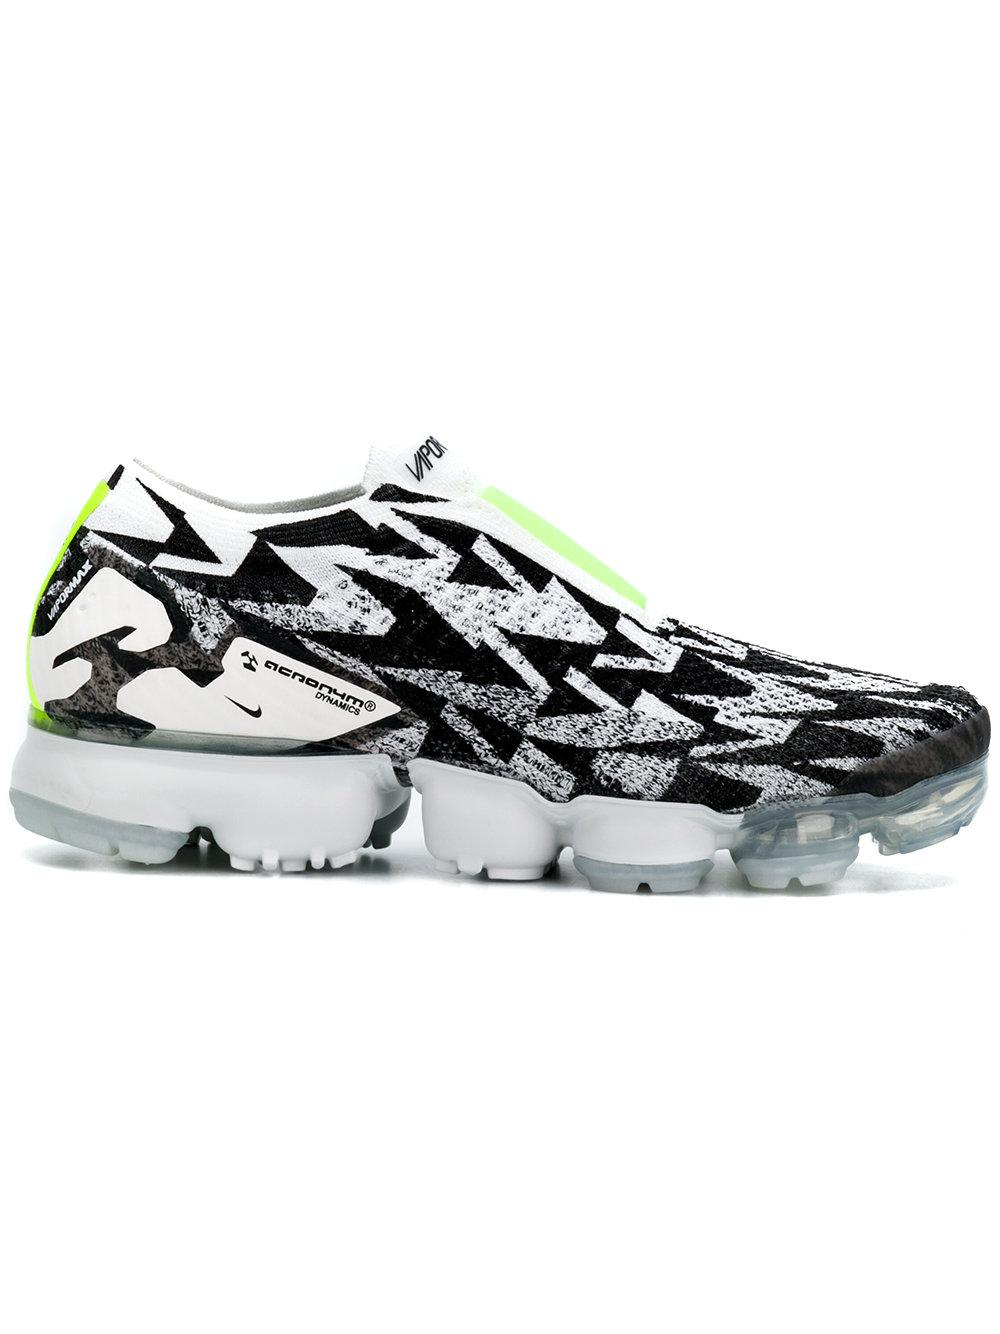 7172c86ae5 Nike Vapormax Sneakers - Farfetch In Black | ModeSens